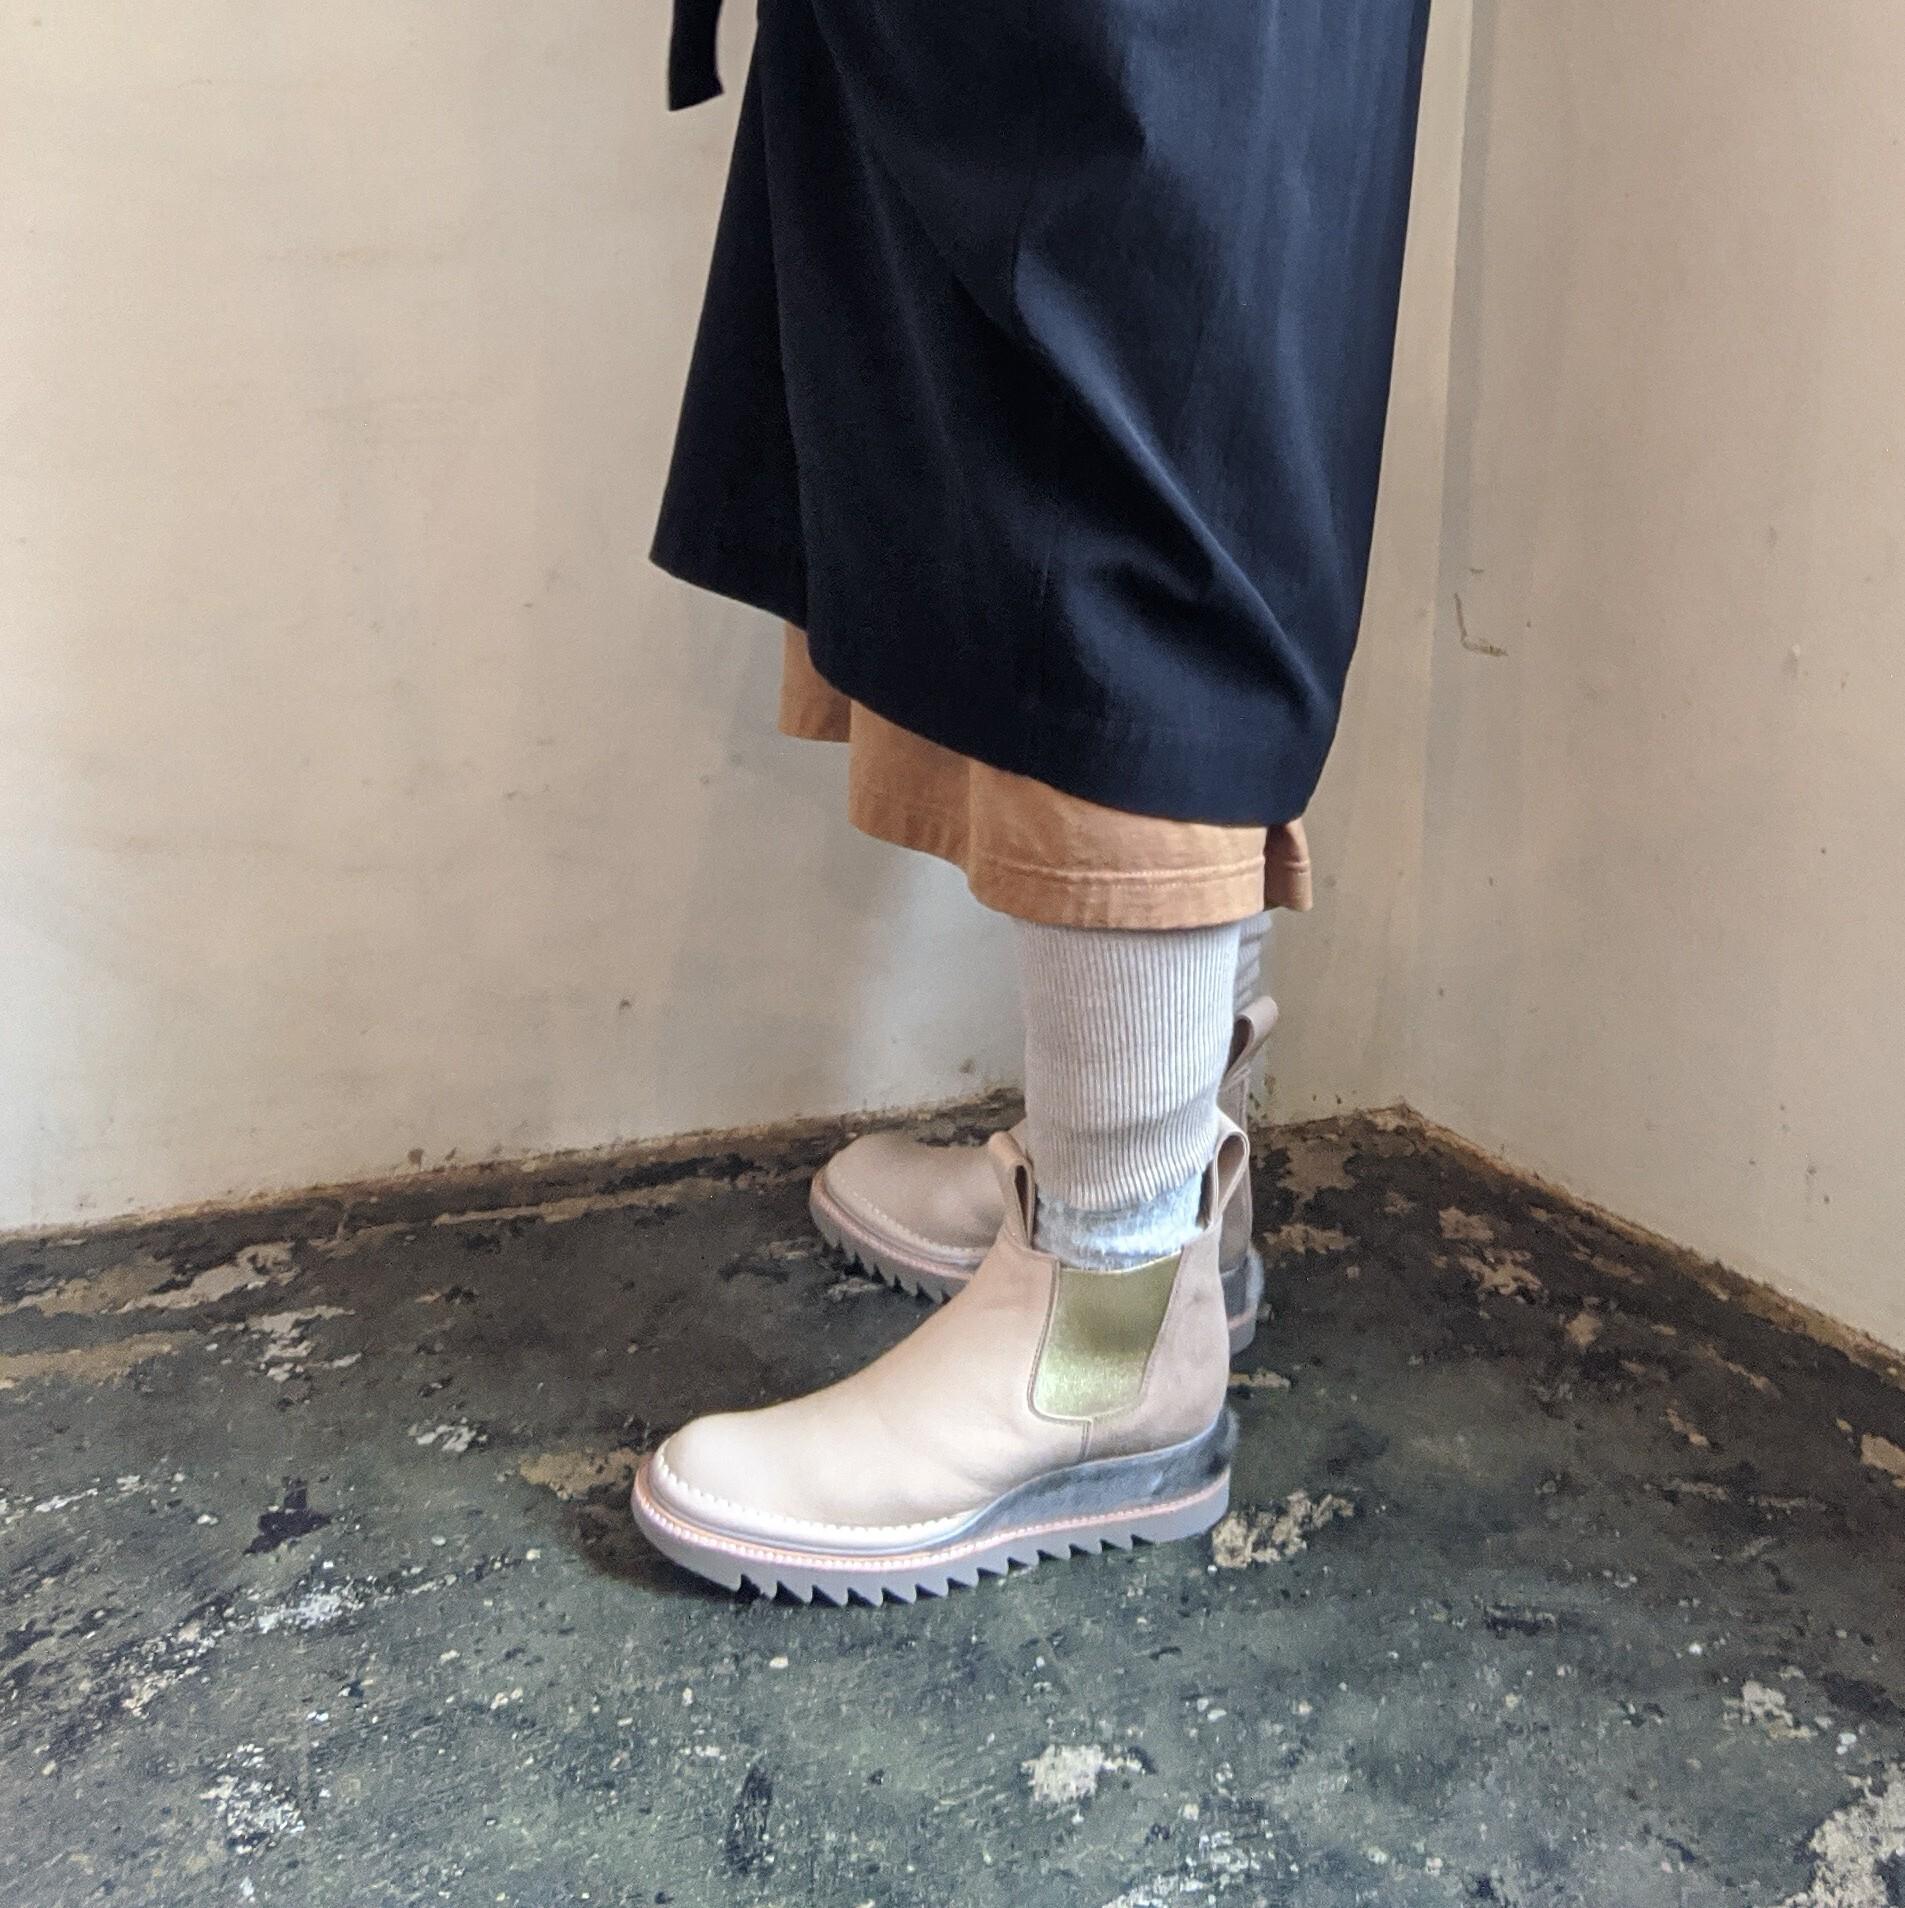 ☆23.5cm【 JUCO. 】ジュコ  灯台ライトブーツ Beige Ladies / サイドゴアブーツ